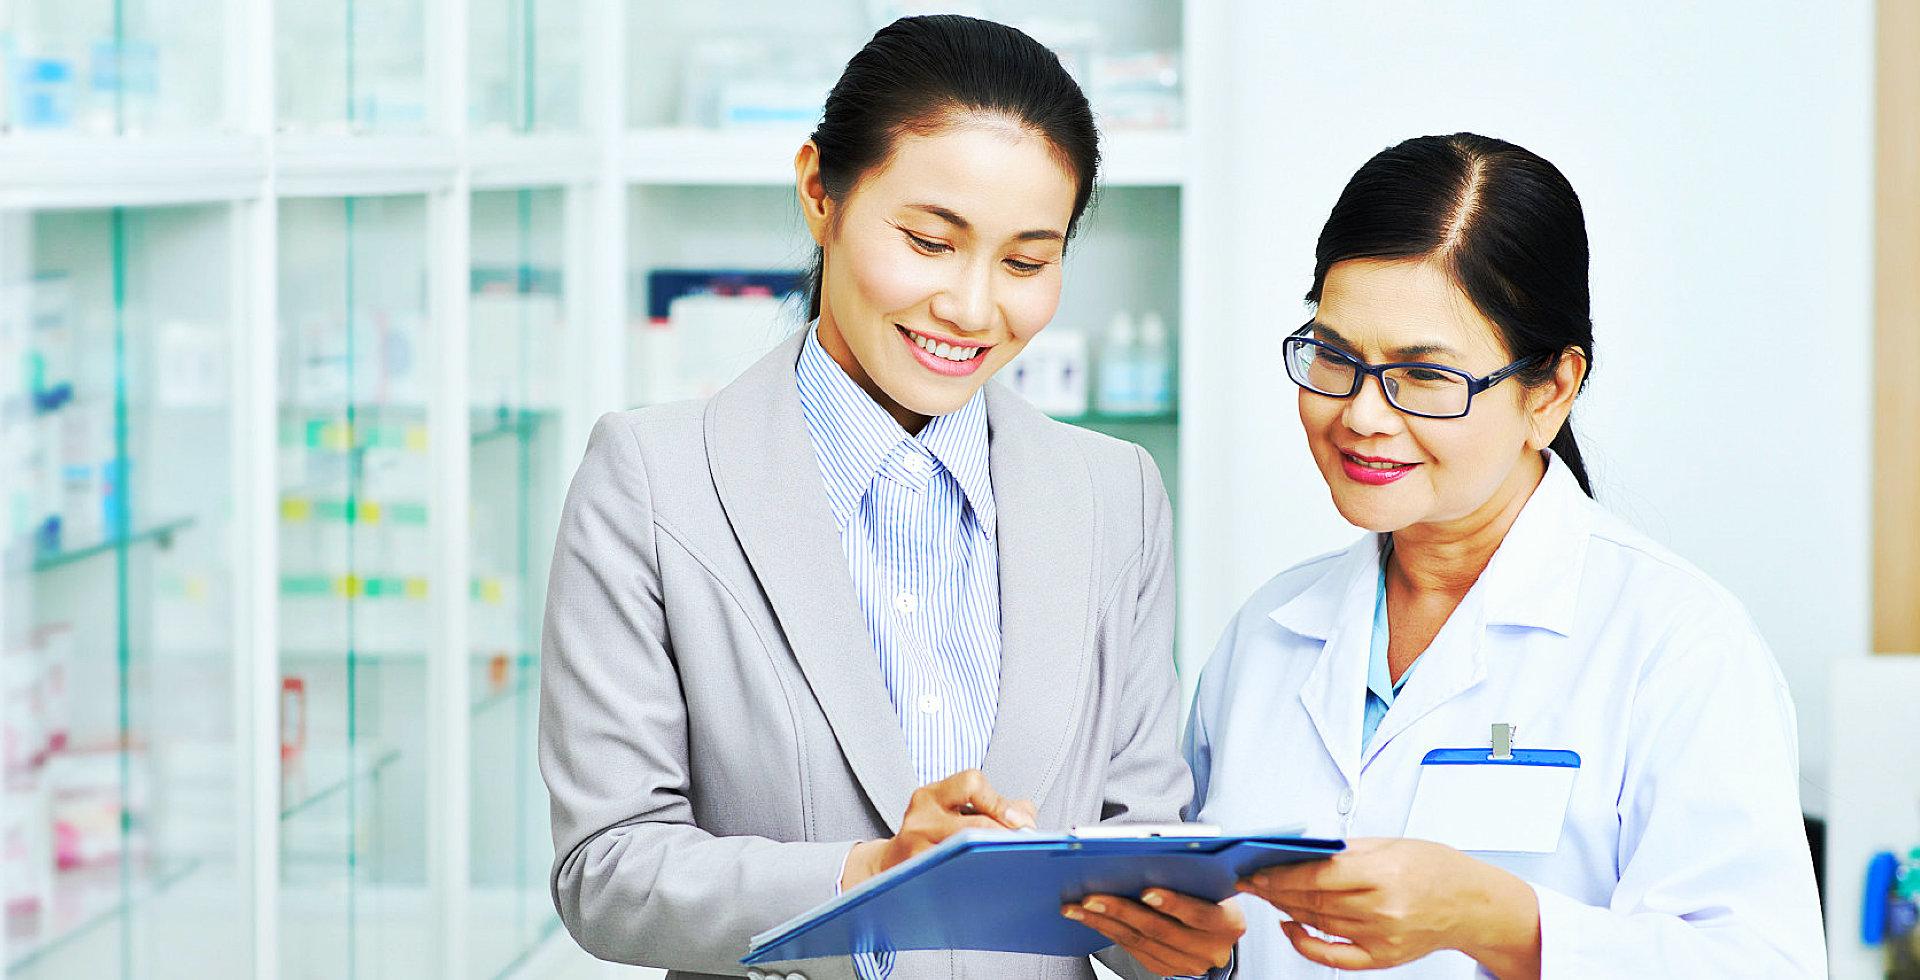 pharmacist having a conversation